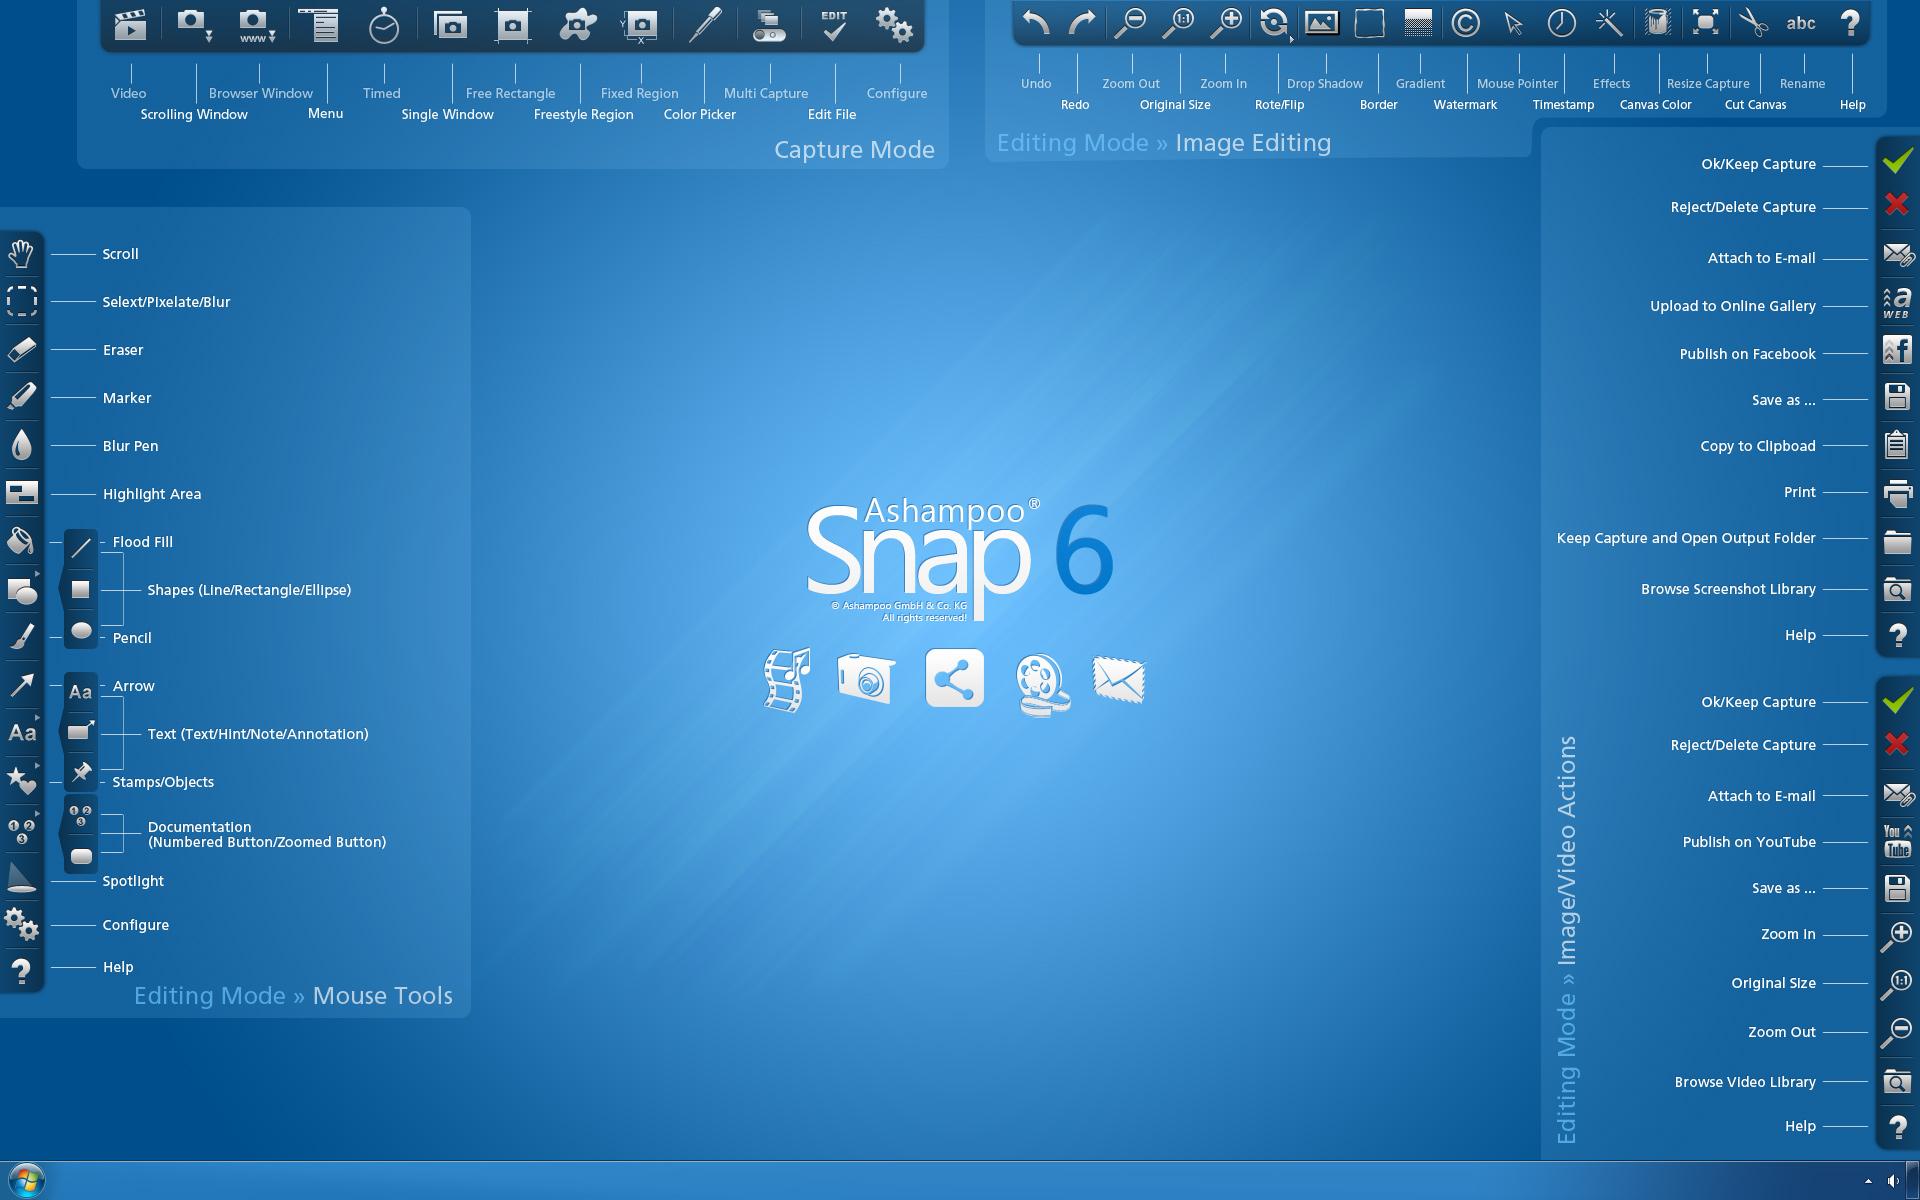 Ashampoo Snap 6 – 屏幕截图软件丨反斗限免